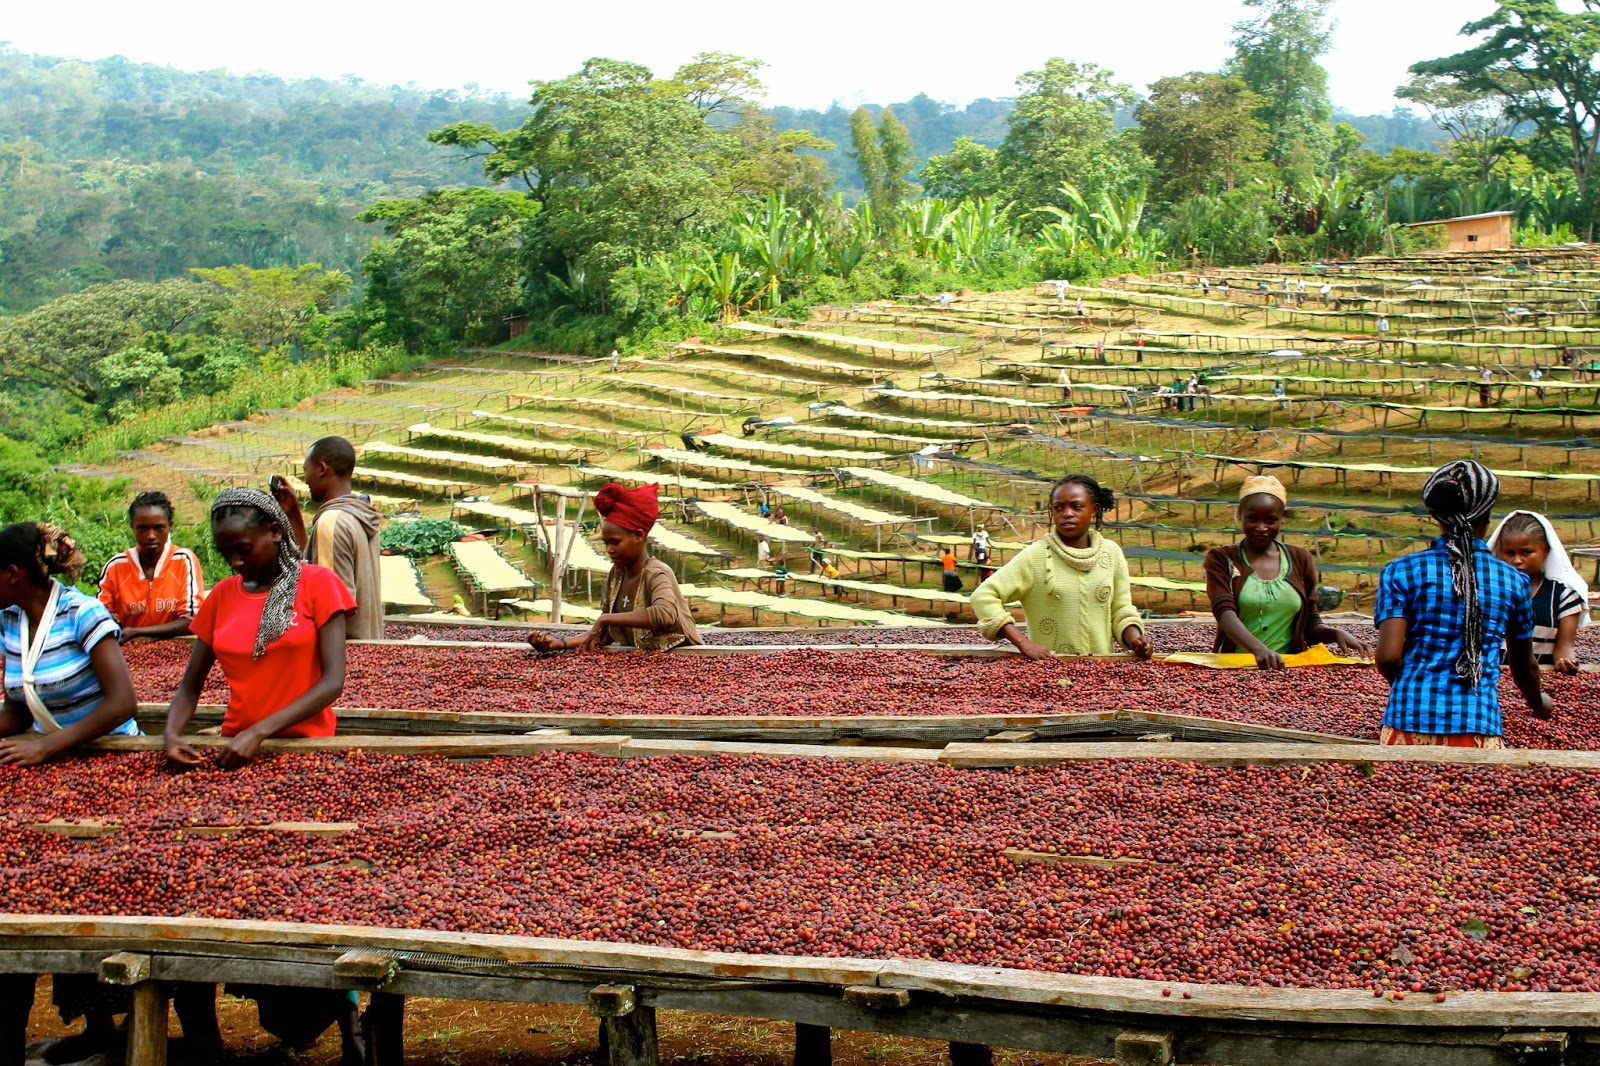 Source: http://smelltheteaandcoffee.blogspot.com/2014/05/ethiopia-comparison.html